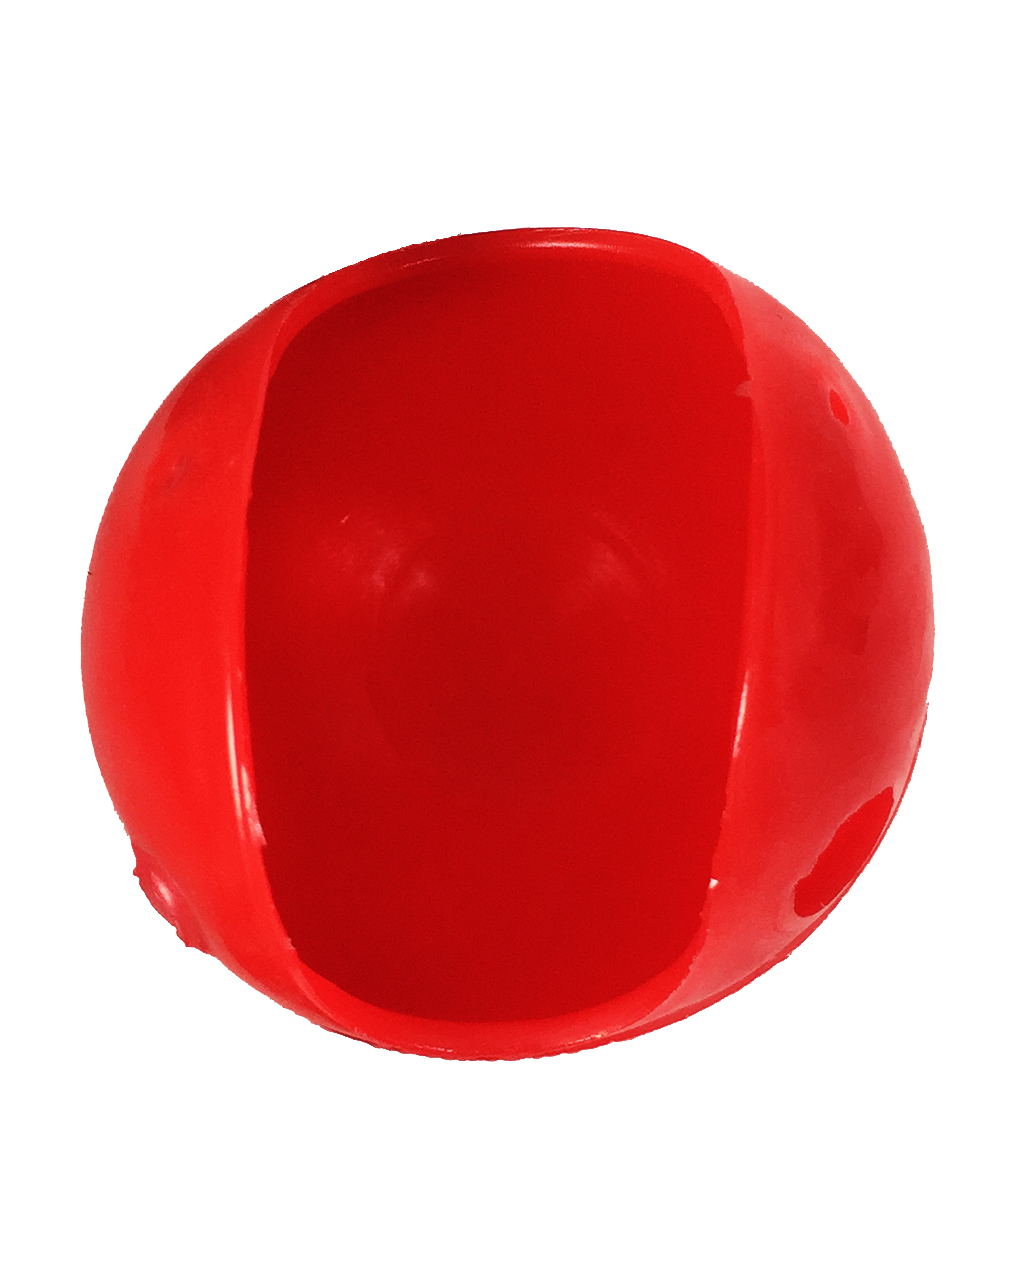 36 Clownsnasen Clown rot Nase Red Nose Day Zirkus Party Fasching Zubehör